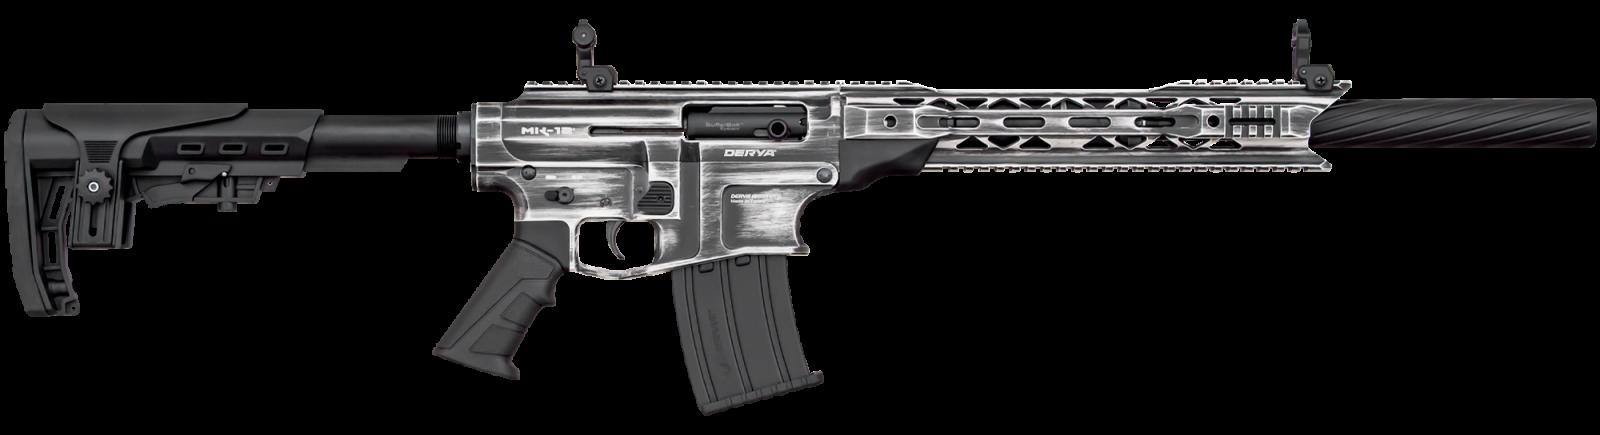 Fusil DERYA ARMS MK-12 calibre 12 NOIR / BLANC VINTAGE